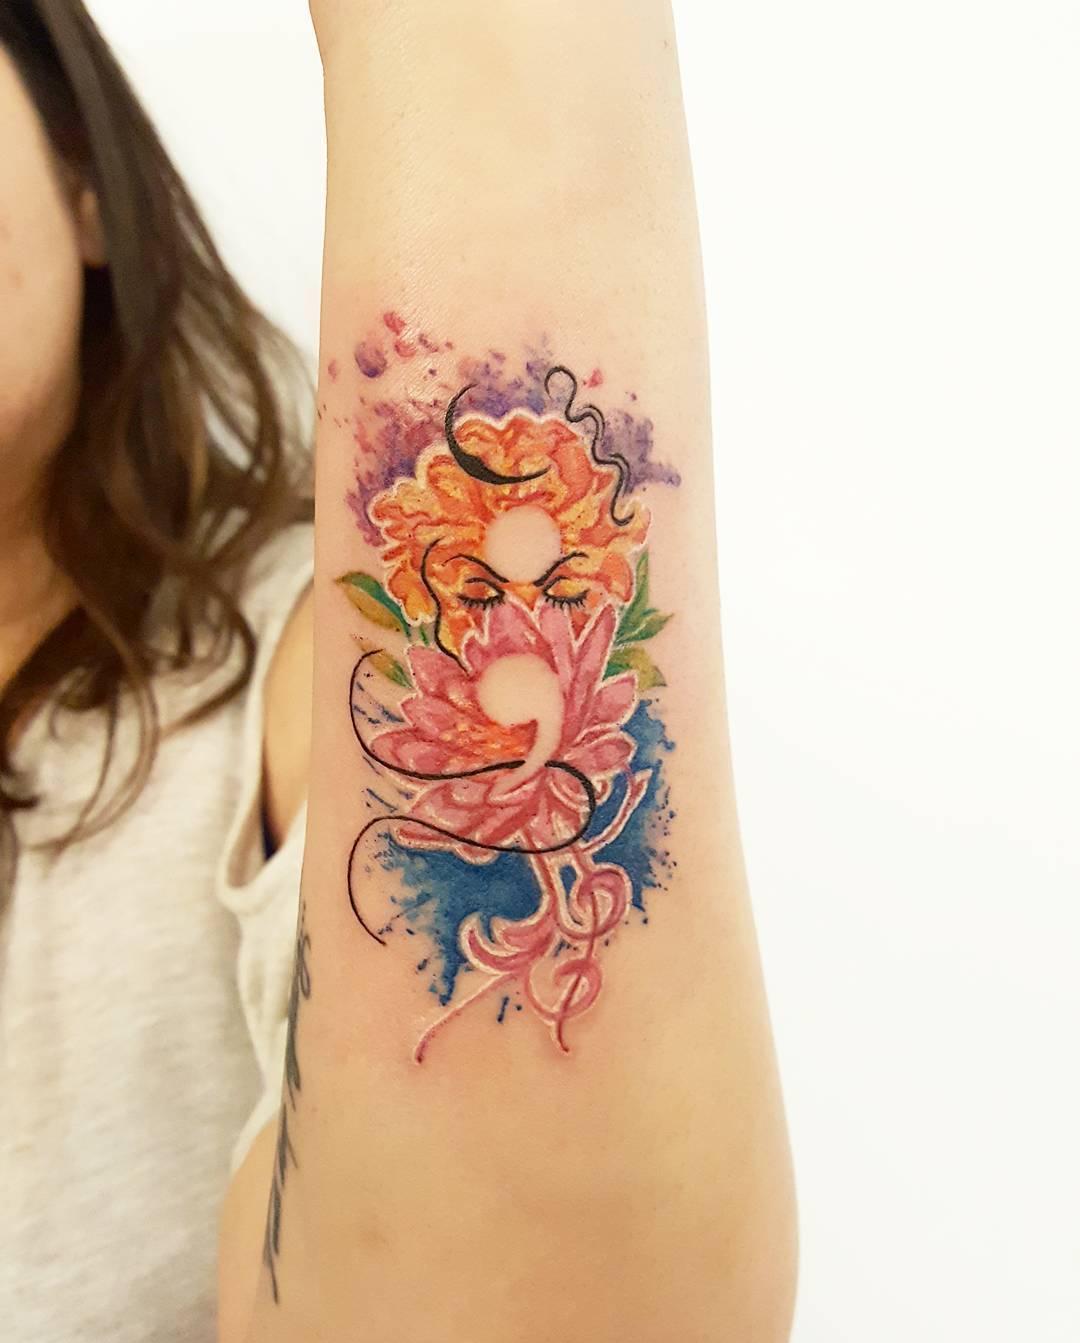 Semicolon Tattoo Design: 60+ Encouraging Semicolon Tattoo Ideas